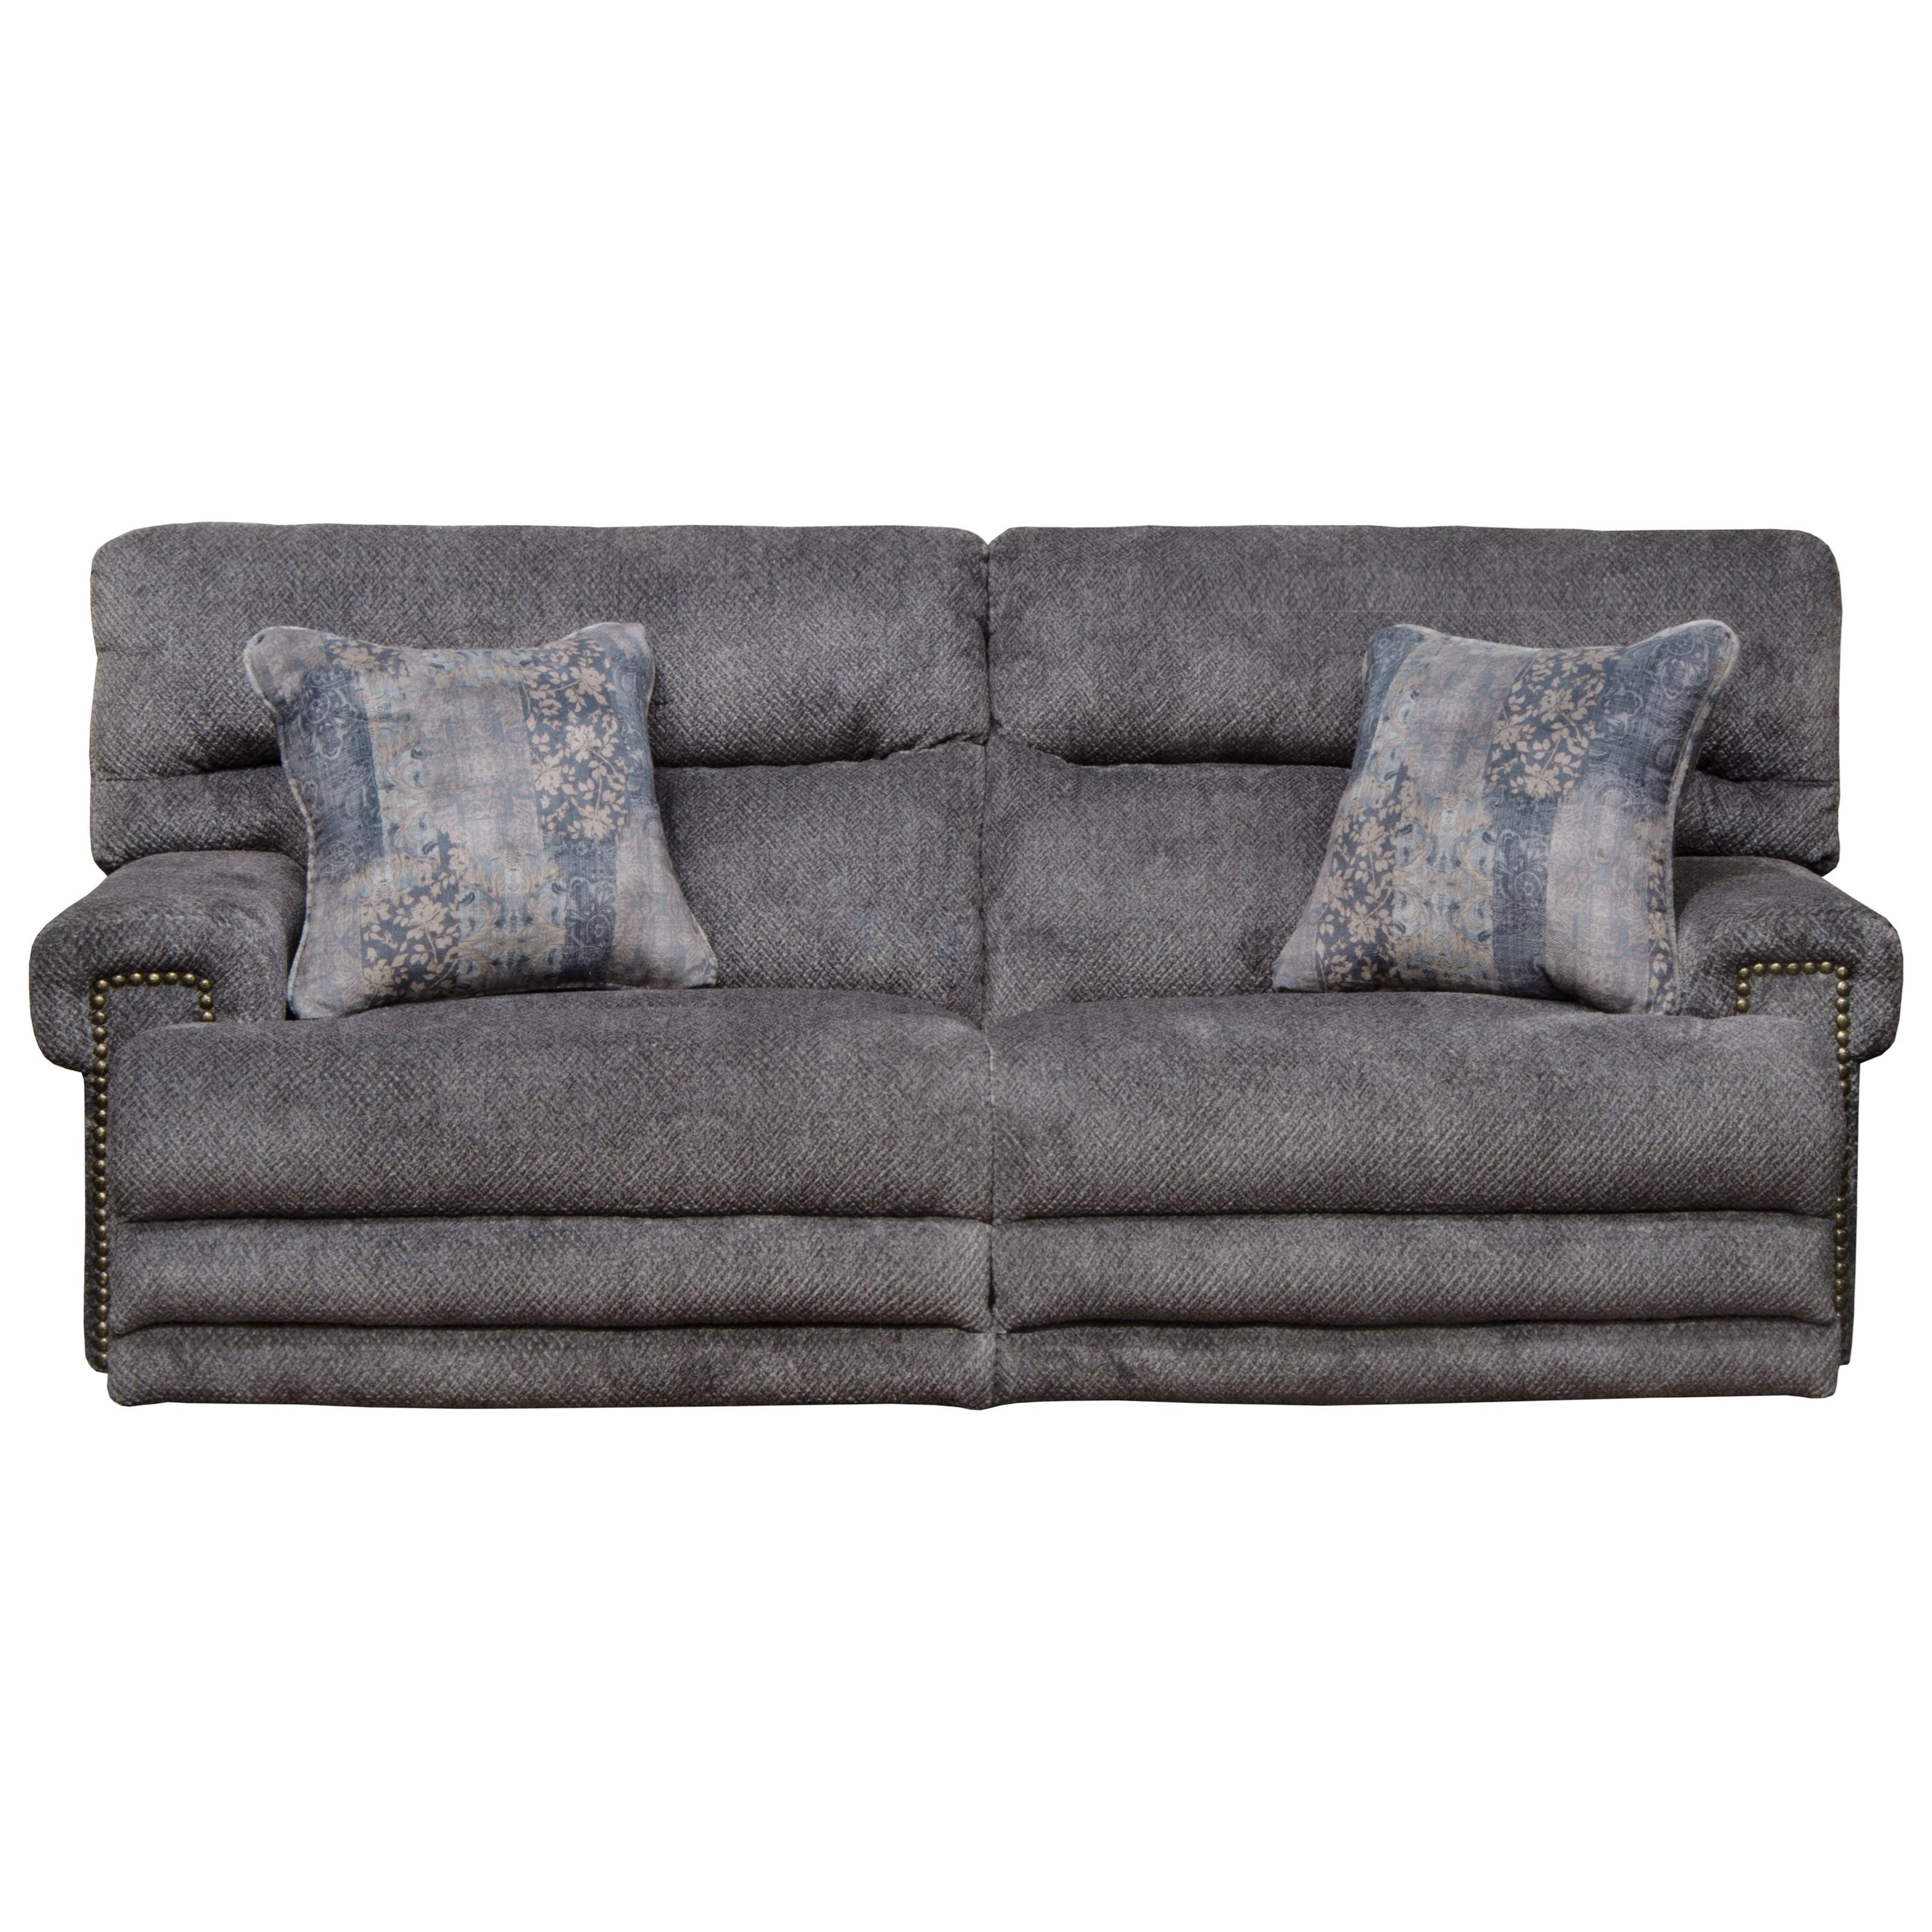 Pwr Headrest w/ Lumbar Pwr LayFlat Sofa